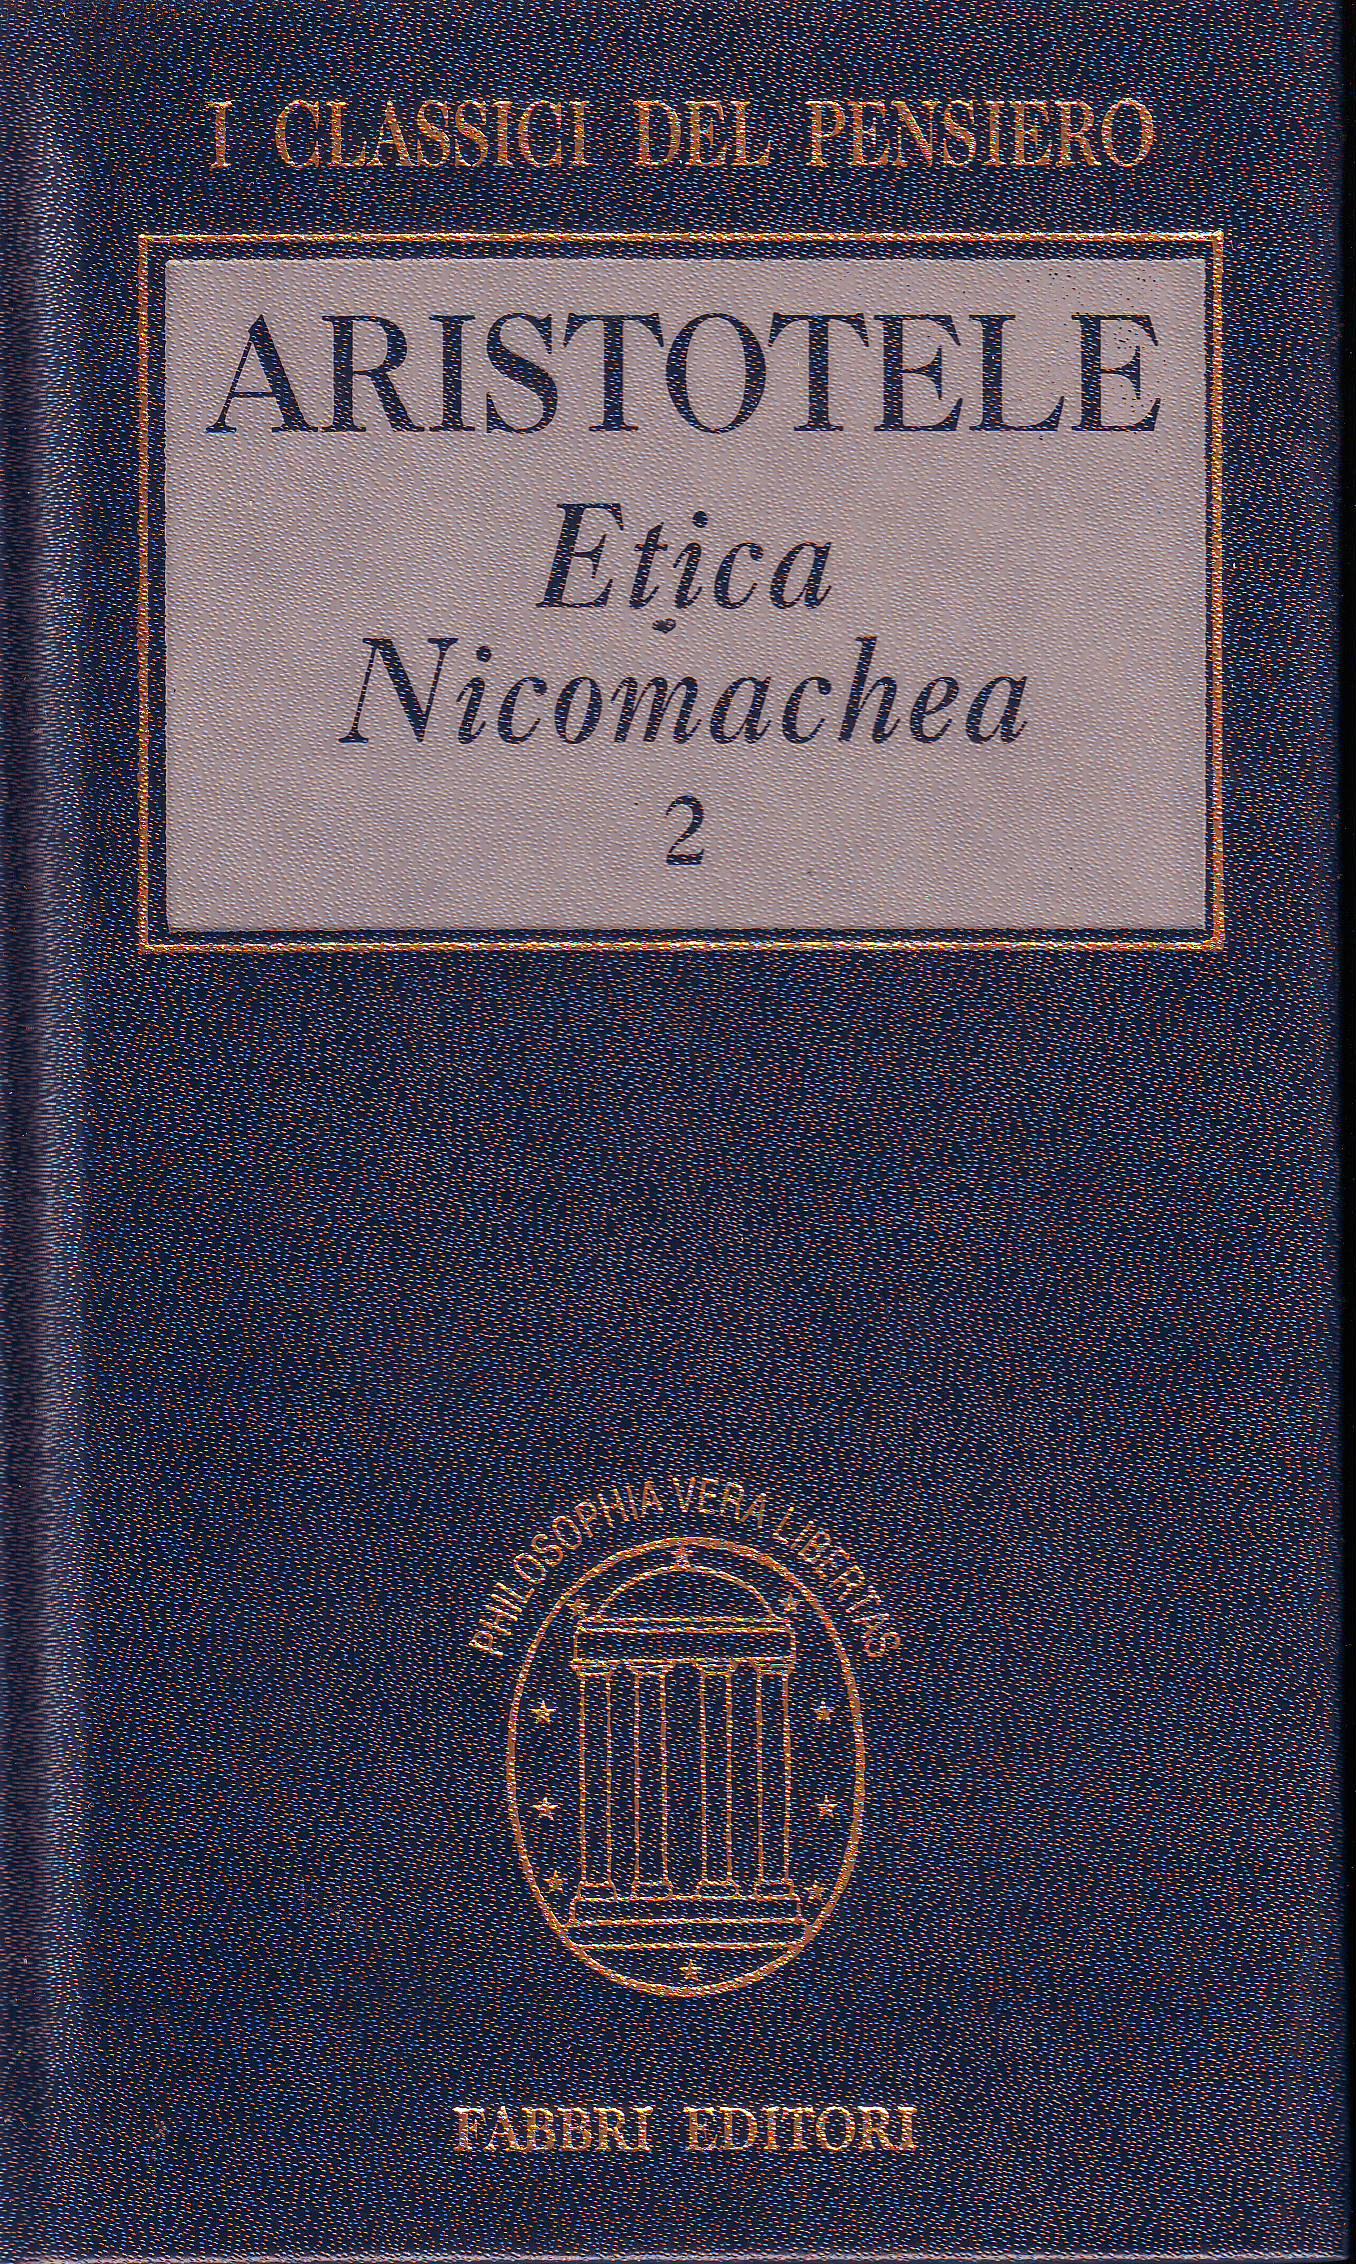 Etica nicomachea vol.2